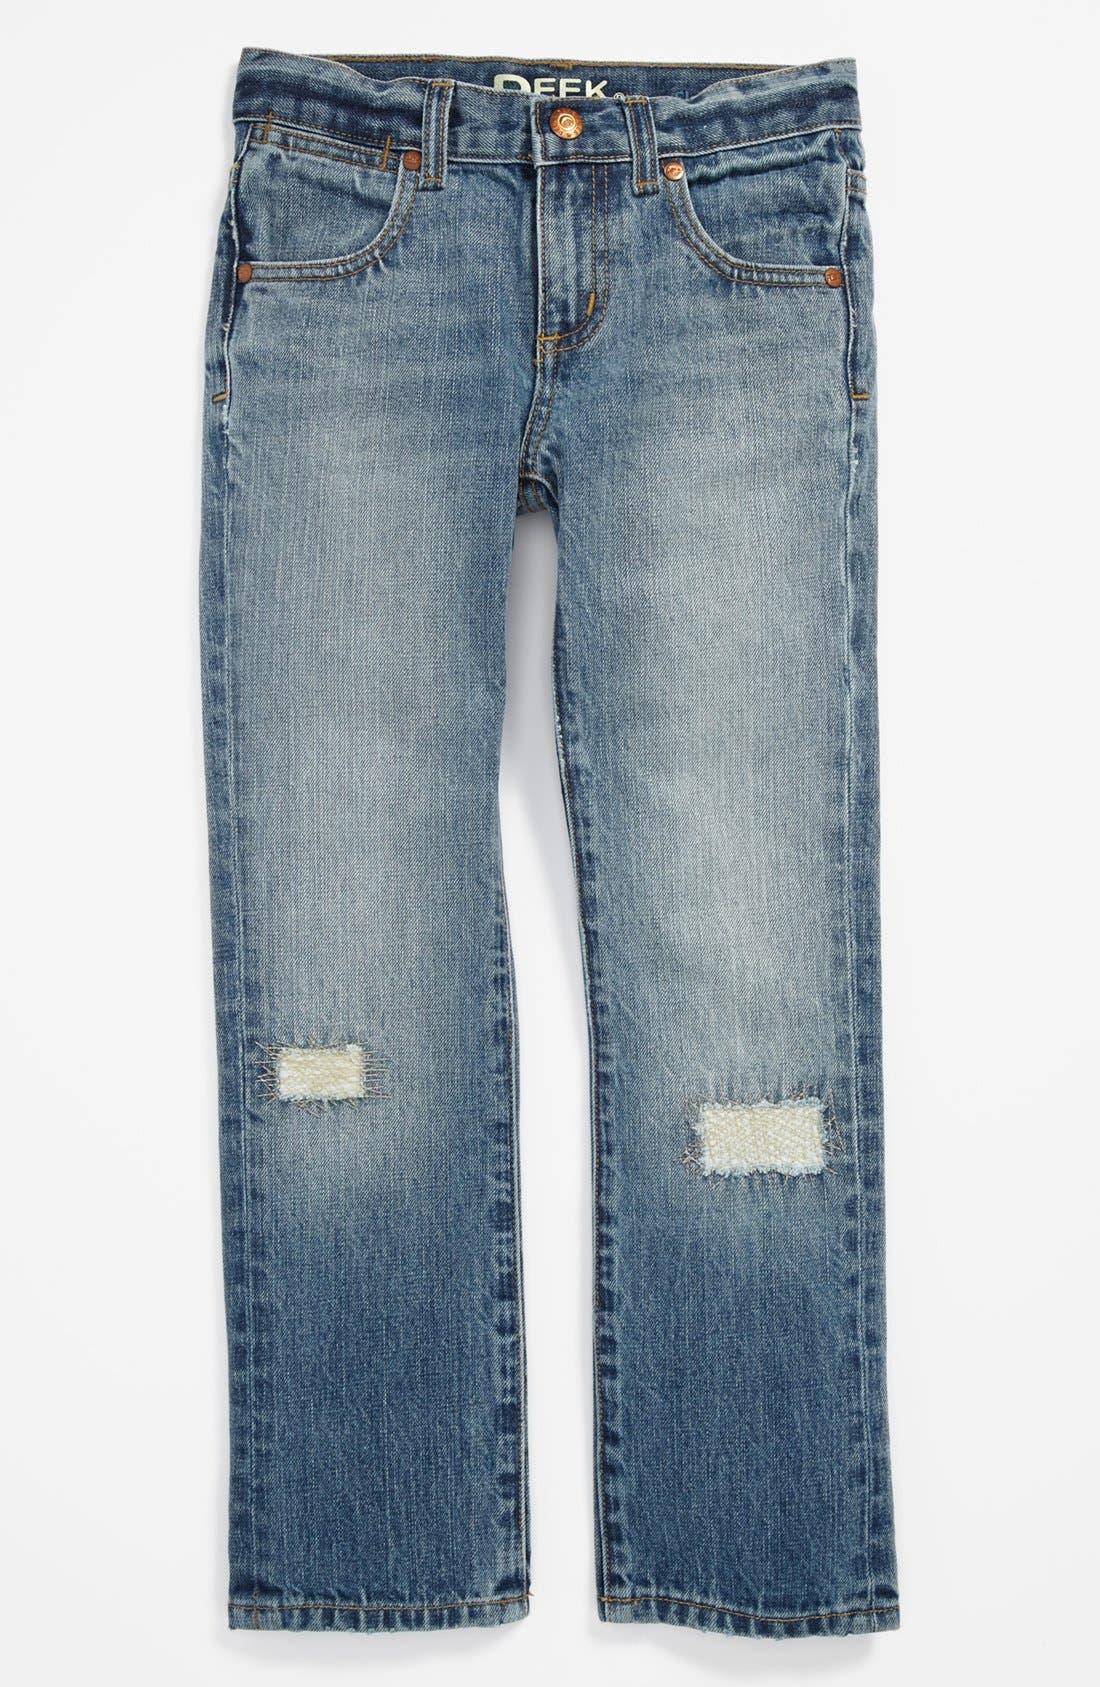 Alternate Image 2  - Peek 'Ellis' Straight Leg Jeans (Toddler Boys, Little Boys & Big Boys)